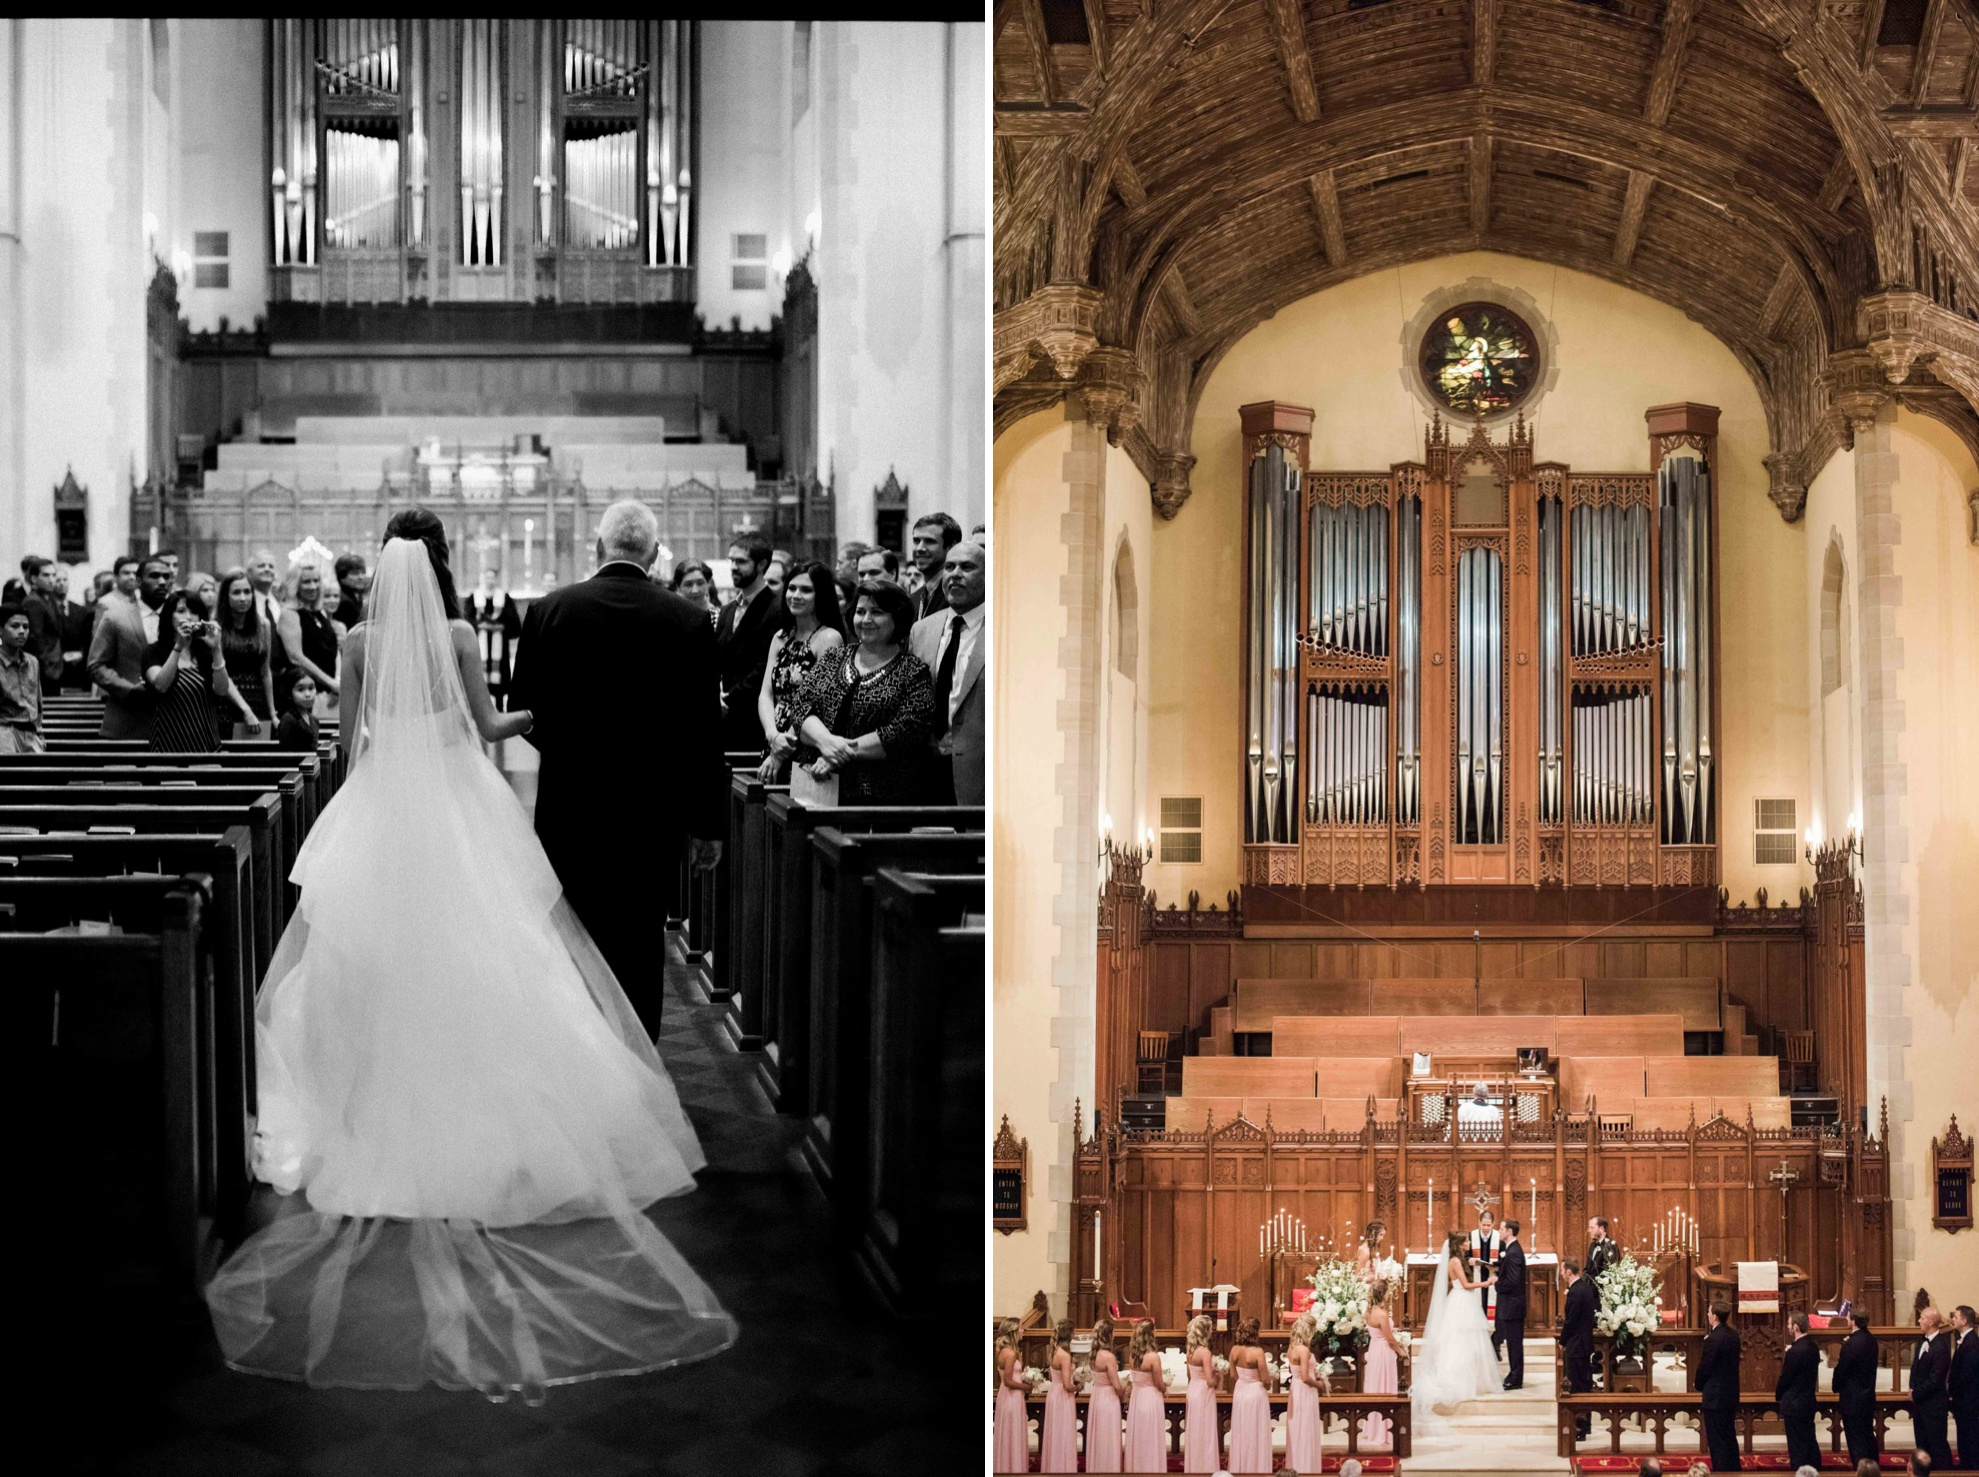 St-Paul's-United Methodist-Wedding-Houston-Photographer-Dana-Fernandez-Weddings-In-Houston-Magazine-Feature-6.jpg